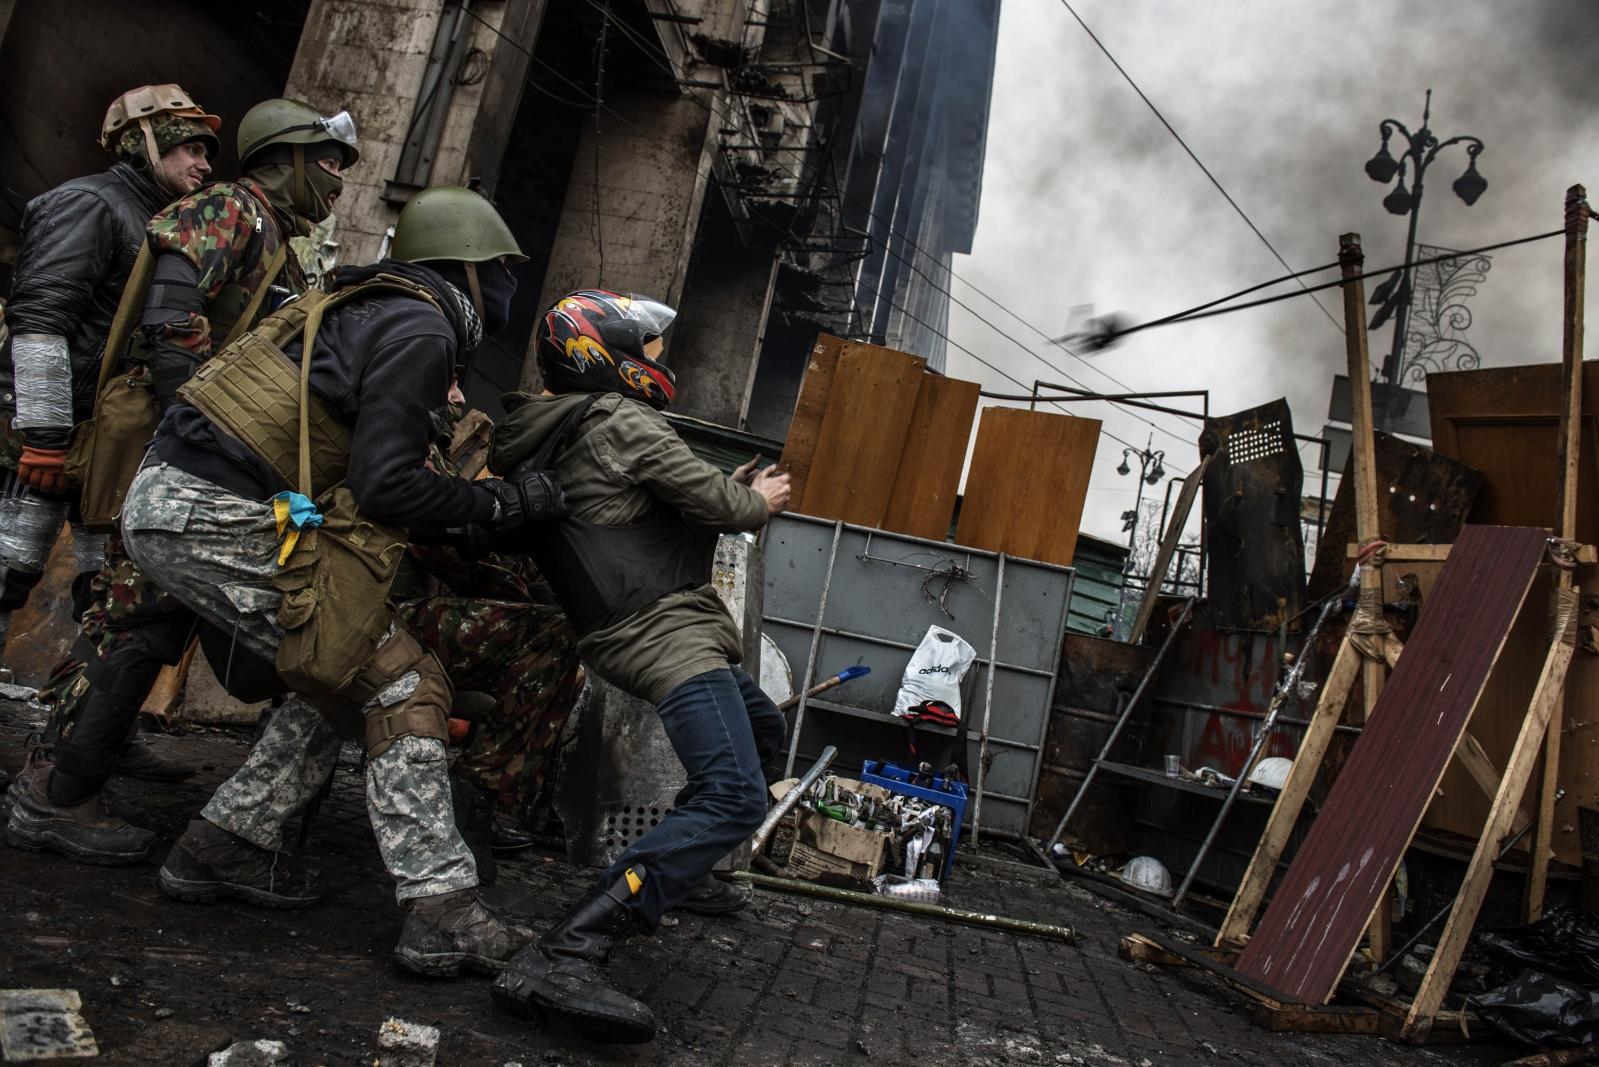 Art and Documentary Photography - Loading Behind_Kiev_s_barricades_028.jpg